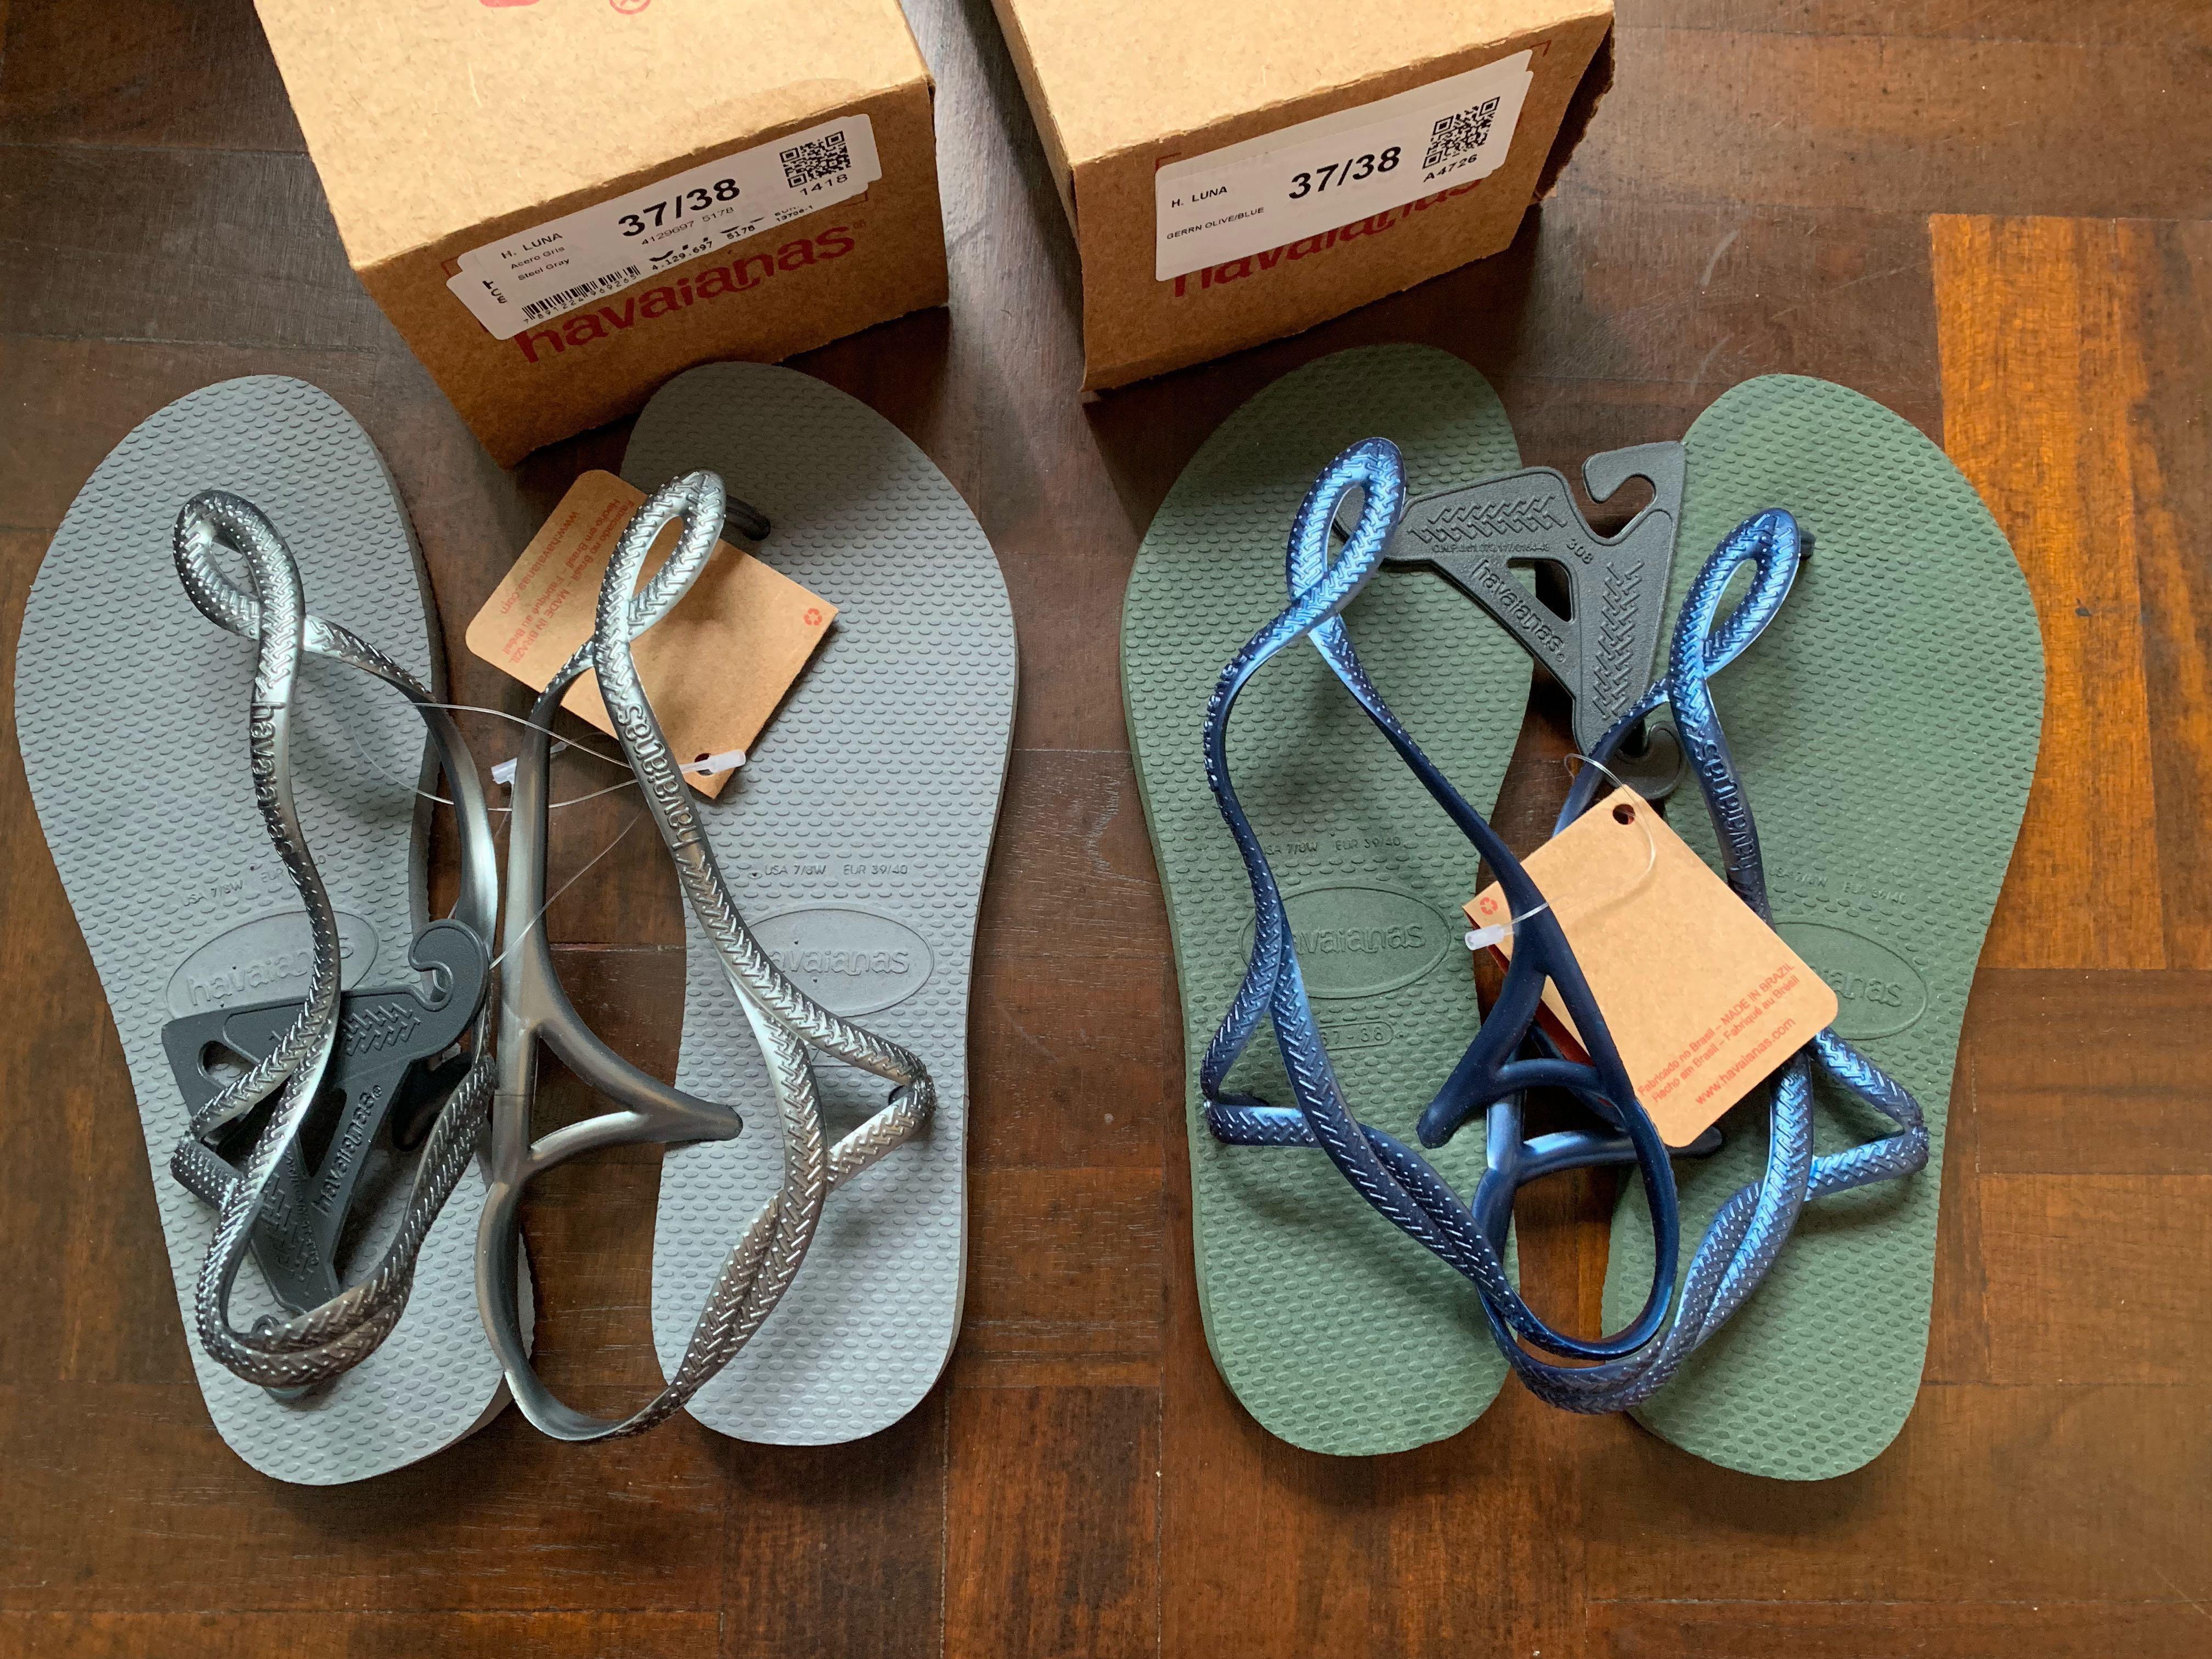 1bc07a5bb88d60 Home · Women s Fashion · Shoes · Flats   Sandals. photo photo photo photo  photo